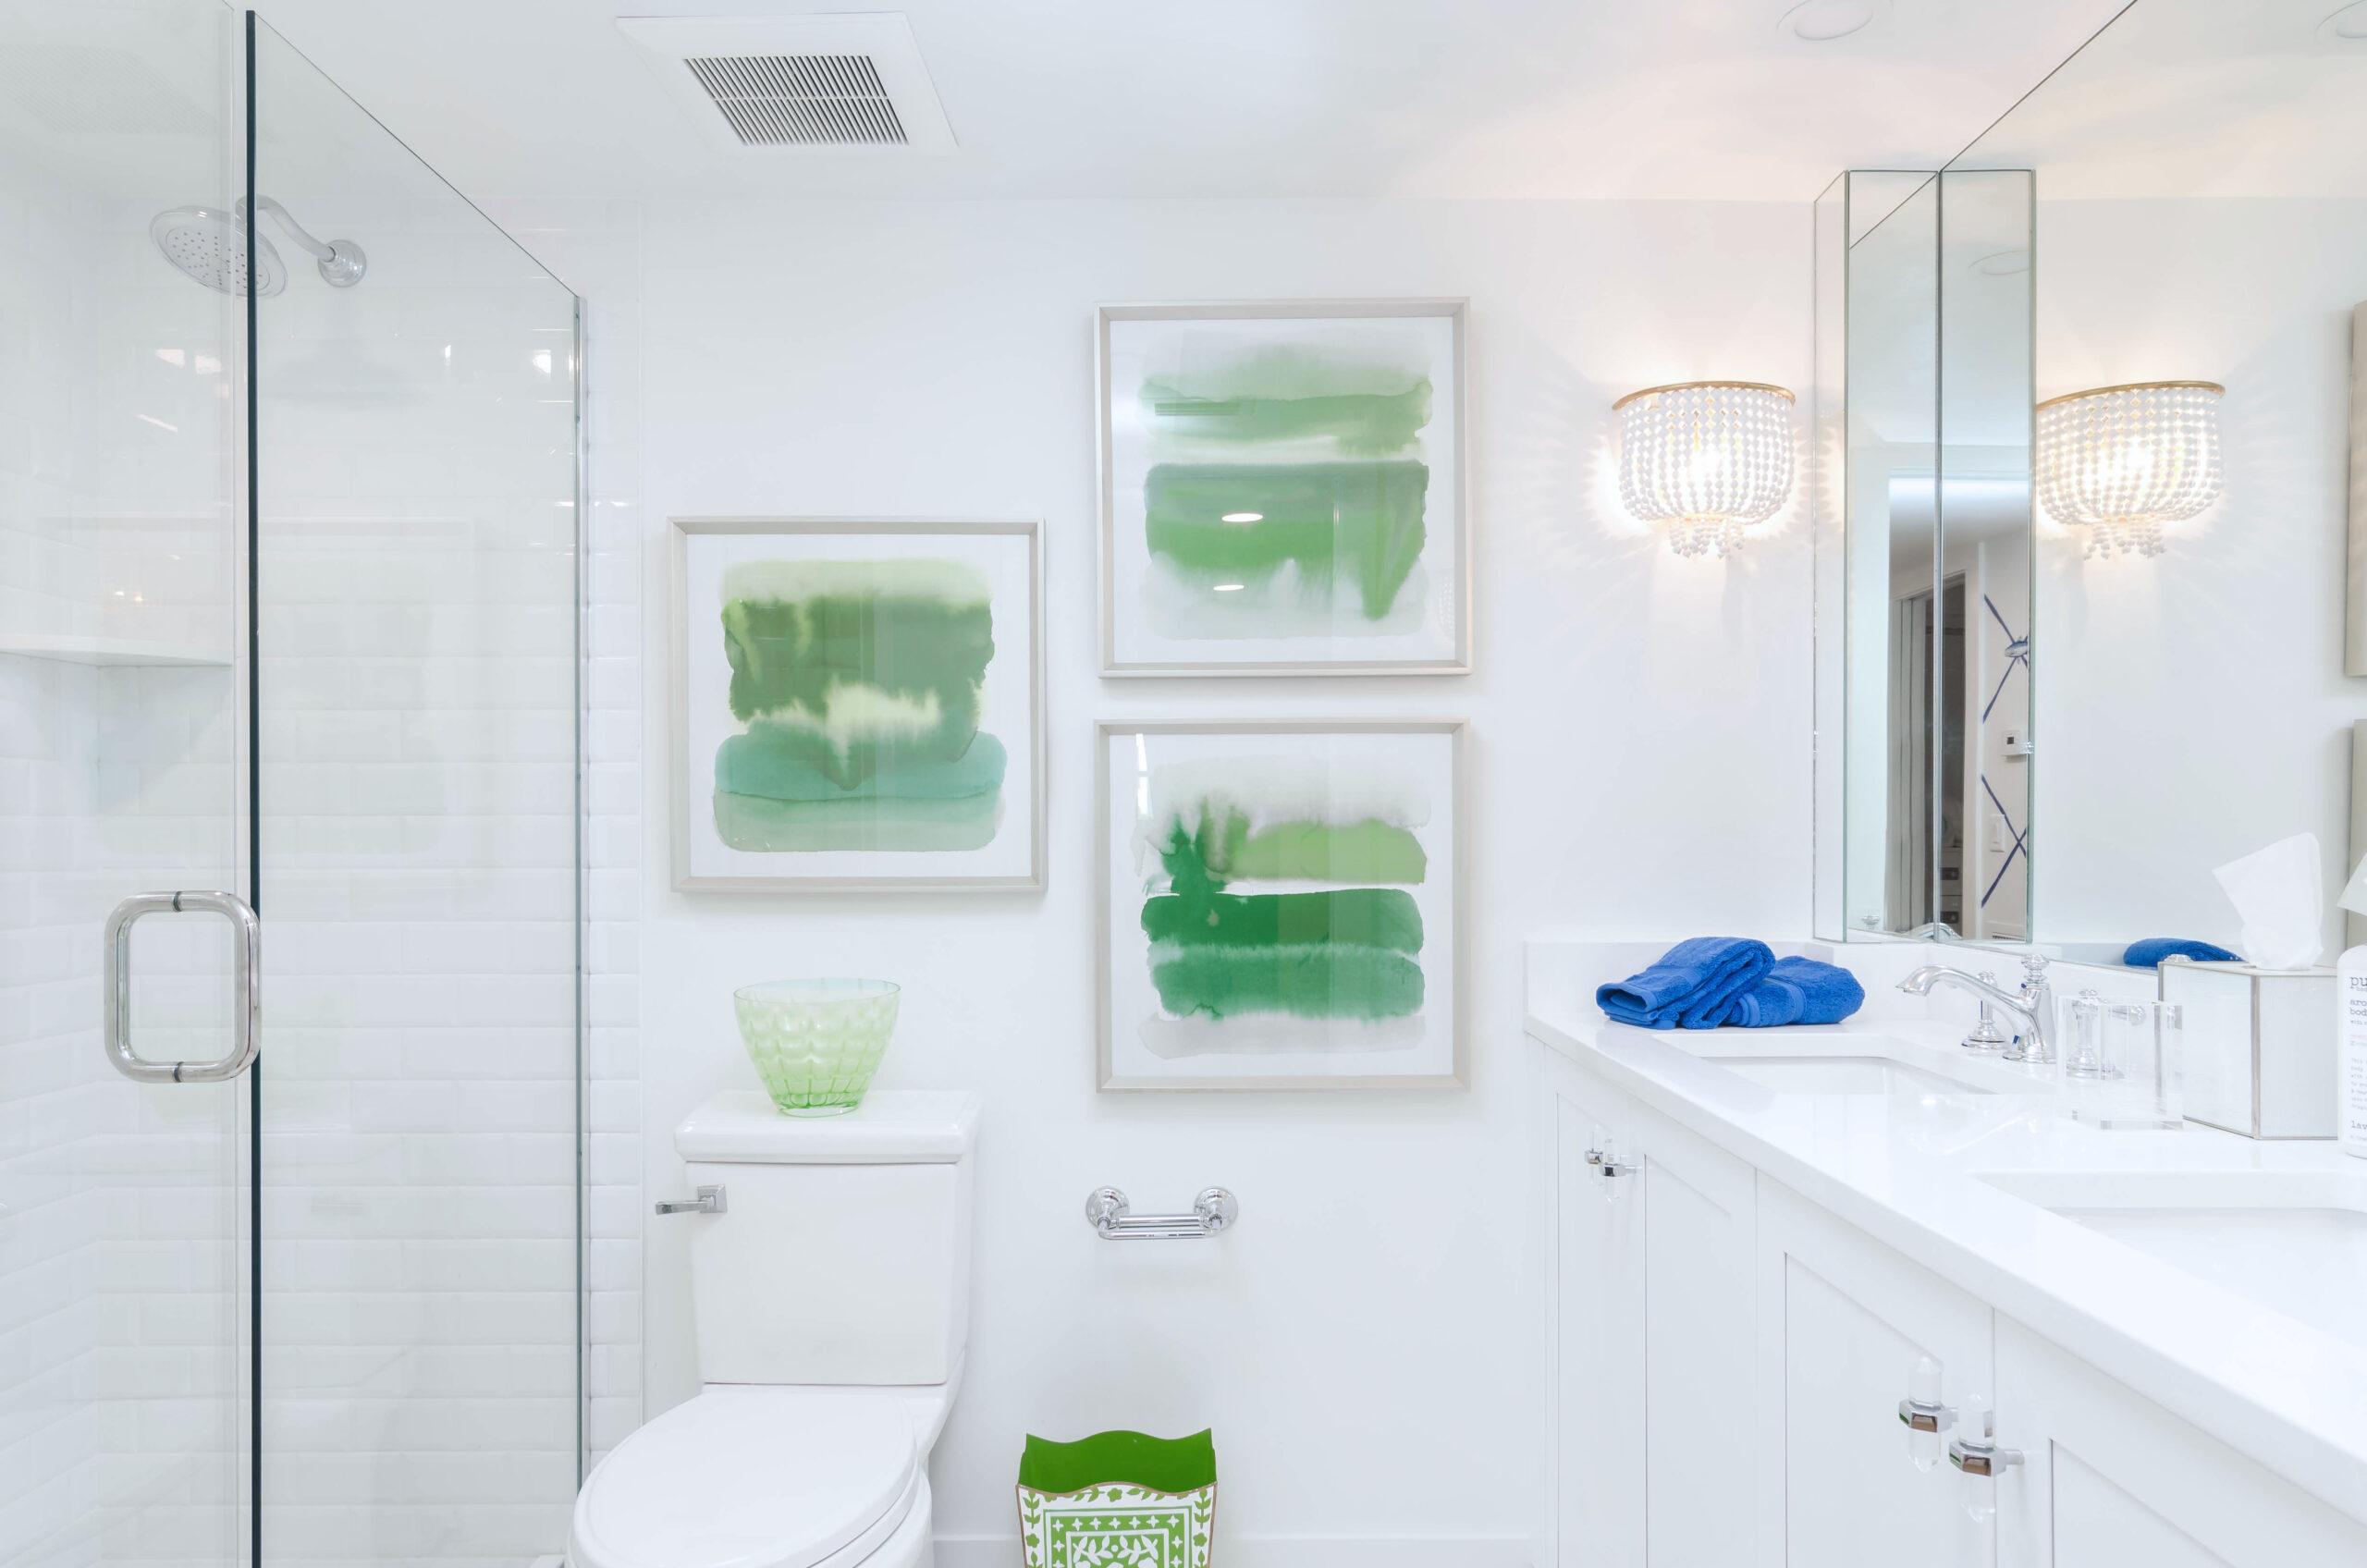 Naples Condominium Remodeling with Guest Bathroom